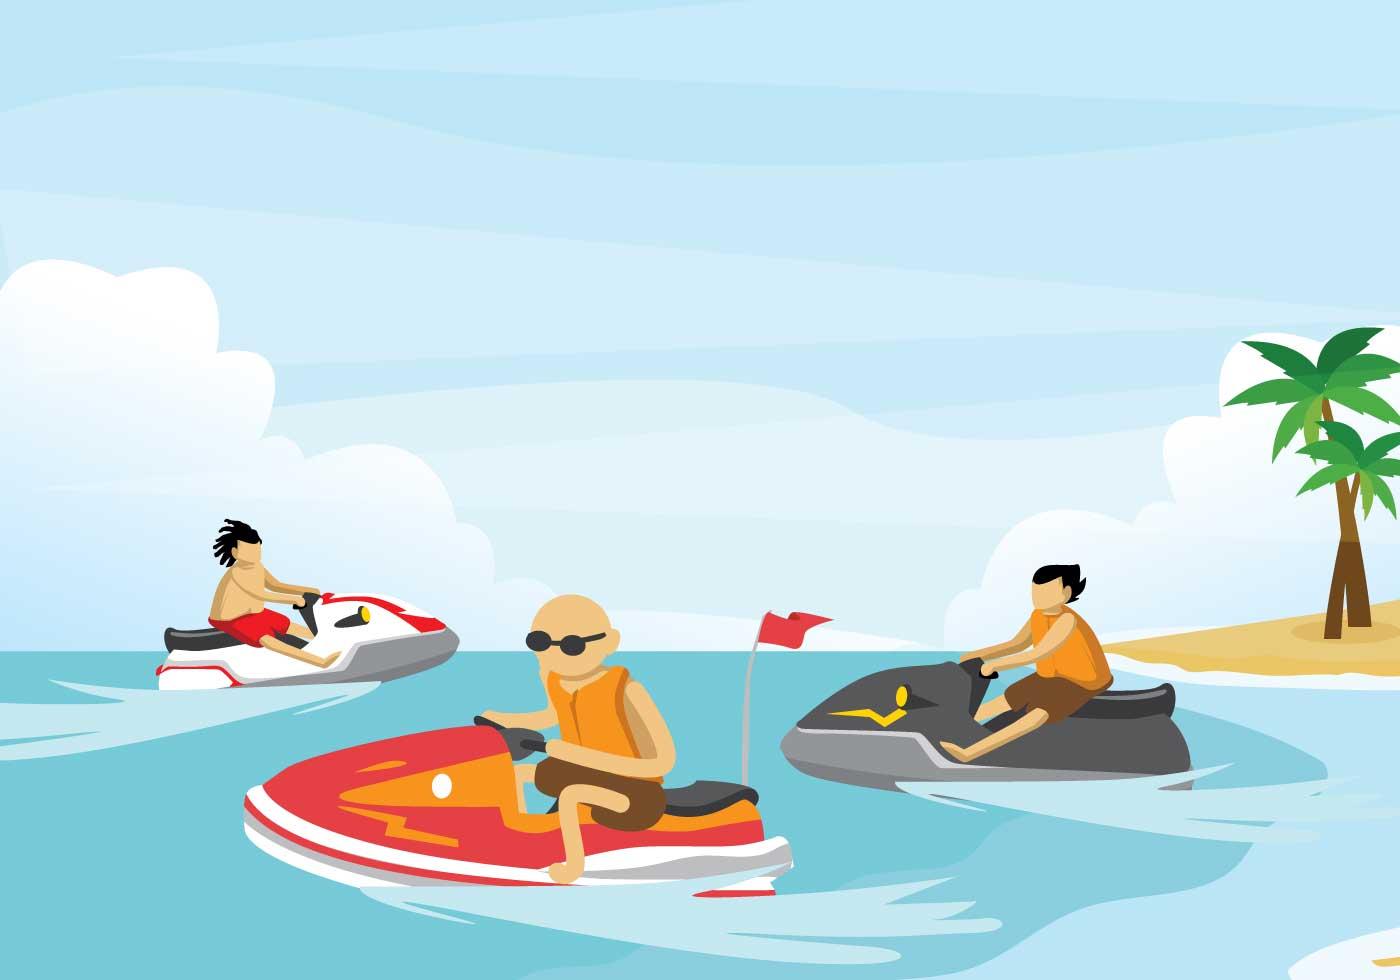 Free jet ski illustration download free vector art stock graphics images - Jet ski dessin ...